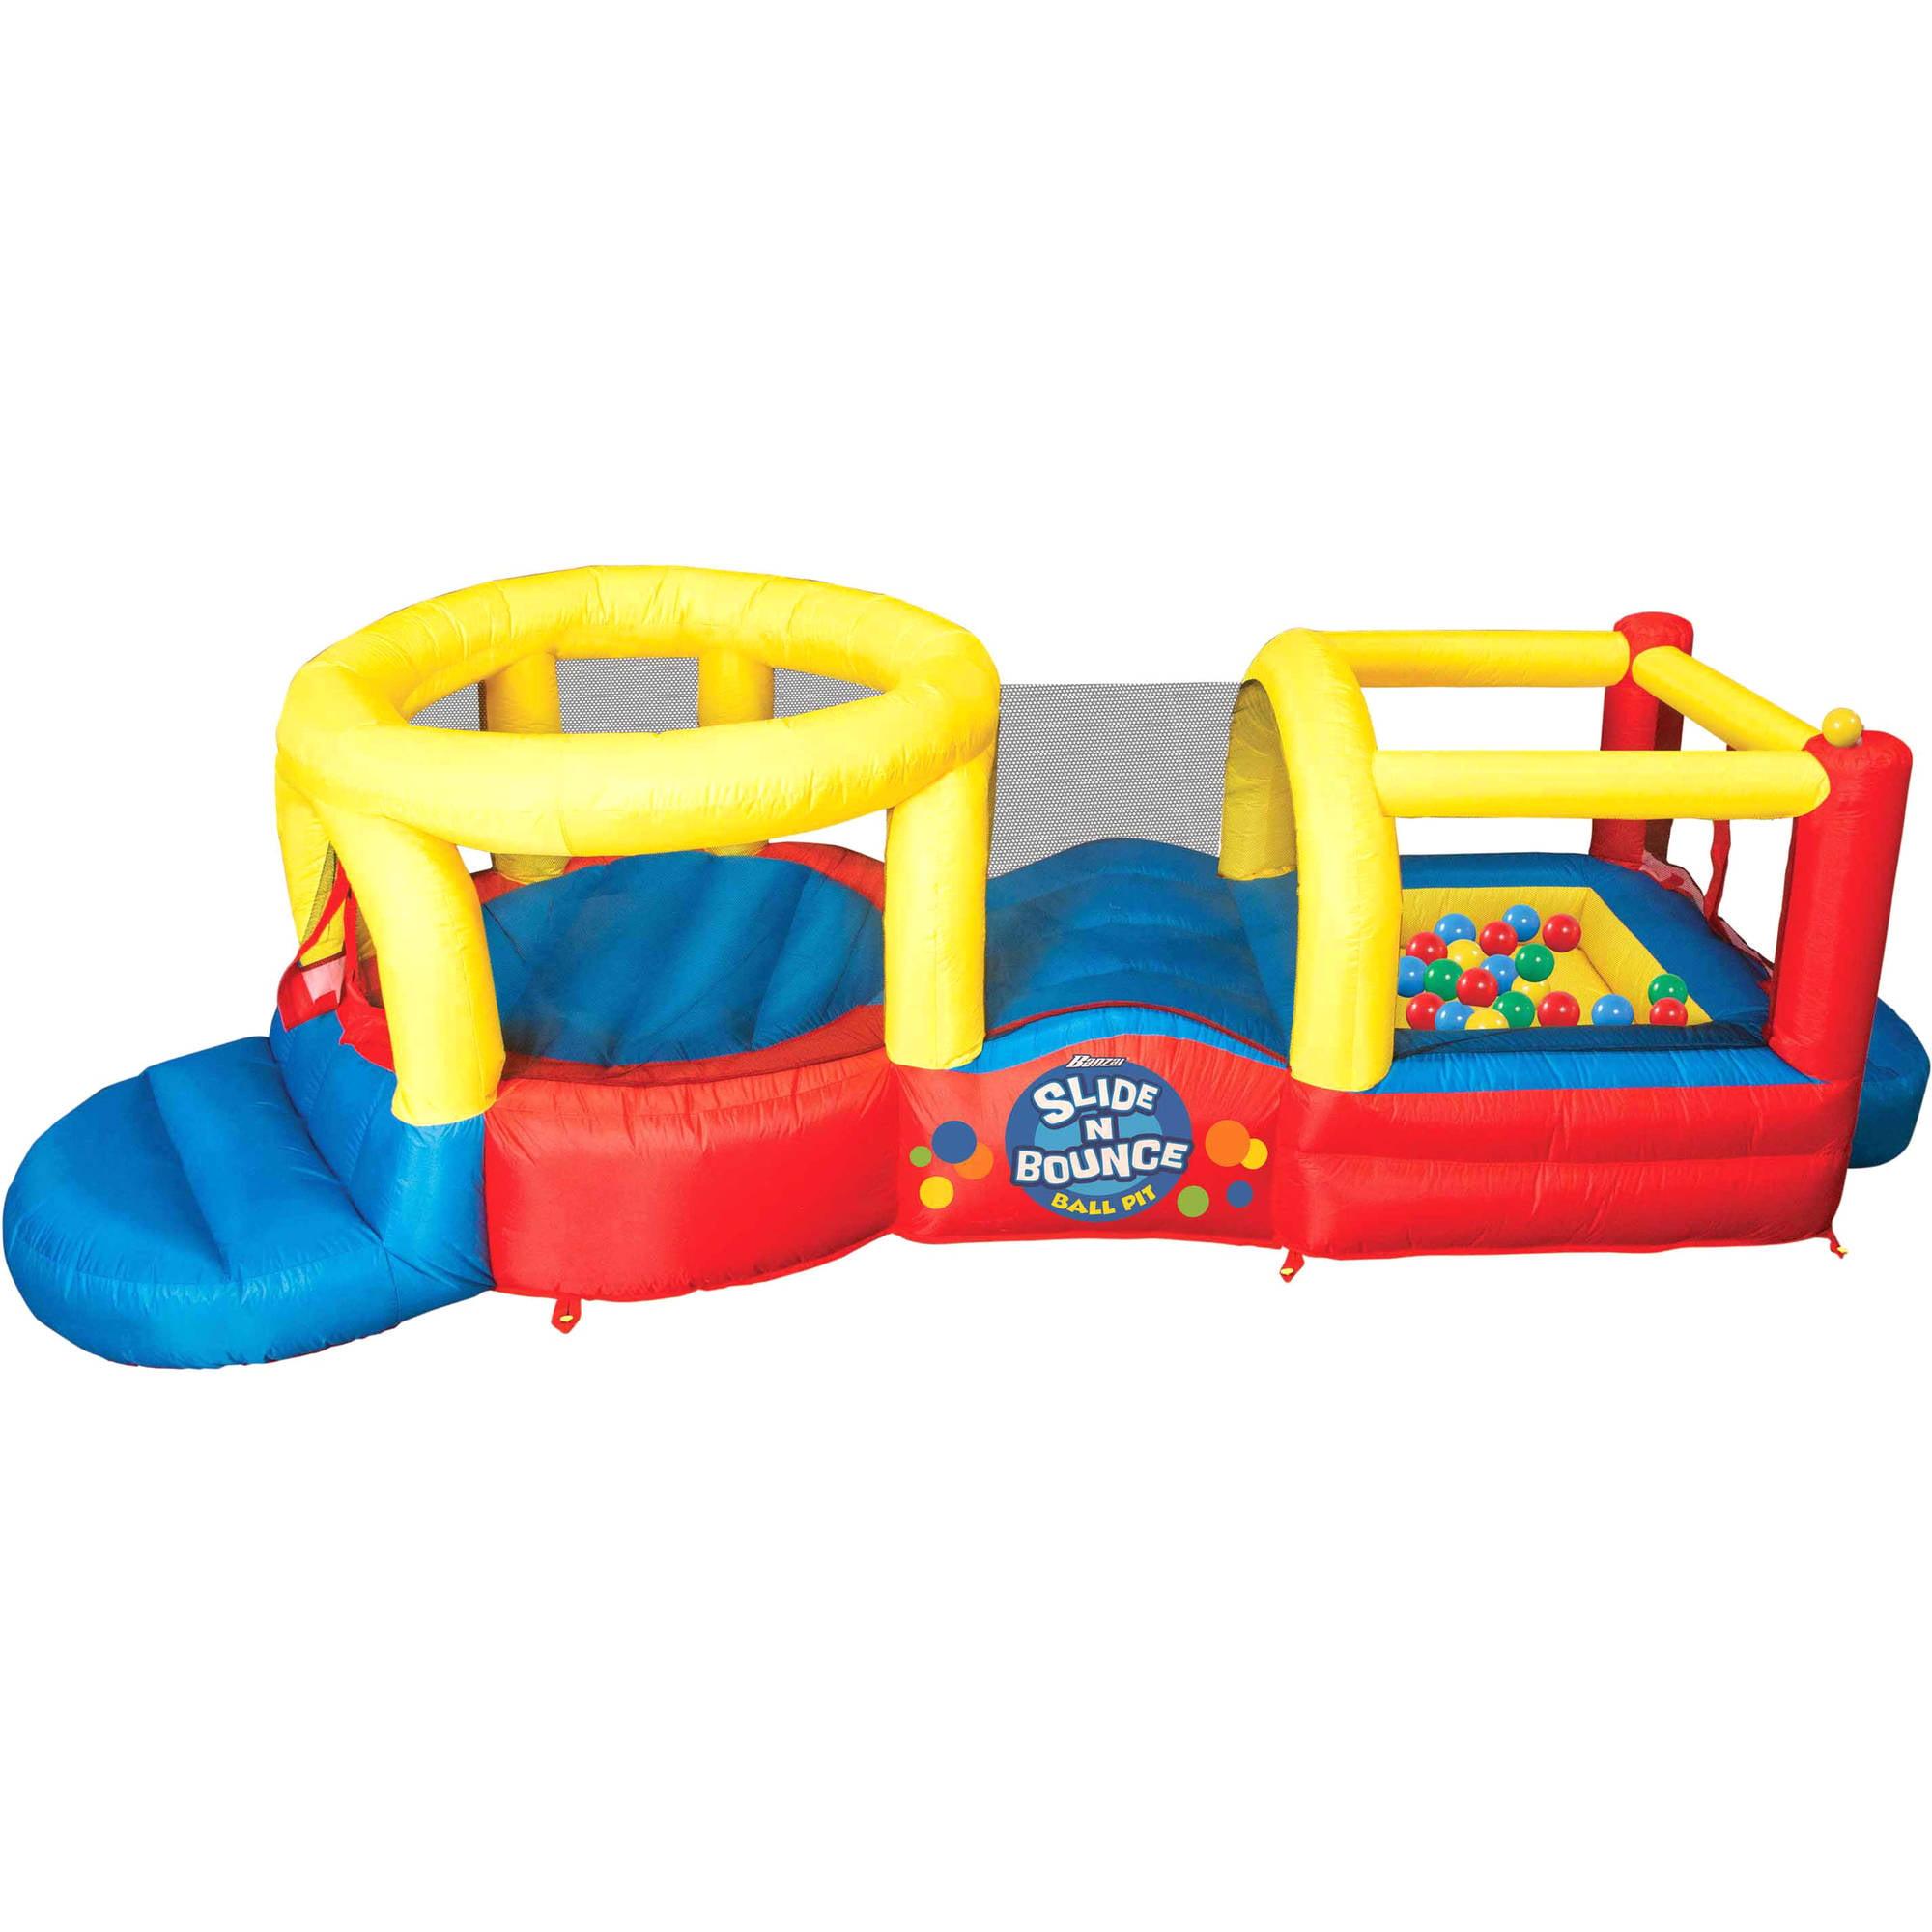 Inflatable Slide Walmart: Banzai Slide 'N Bounce Activity Center (Inflatable